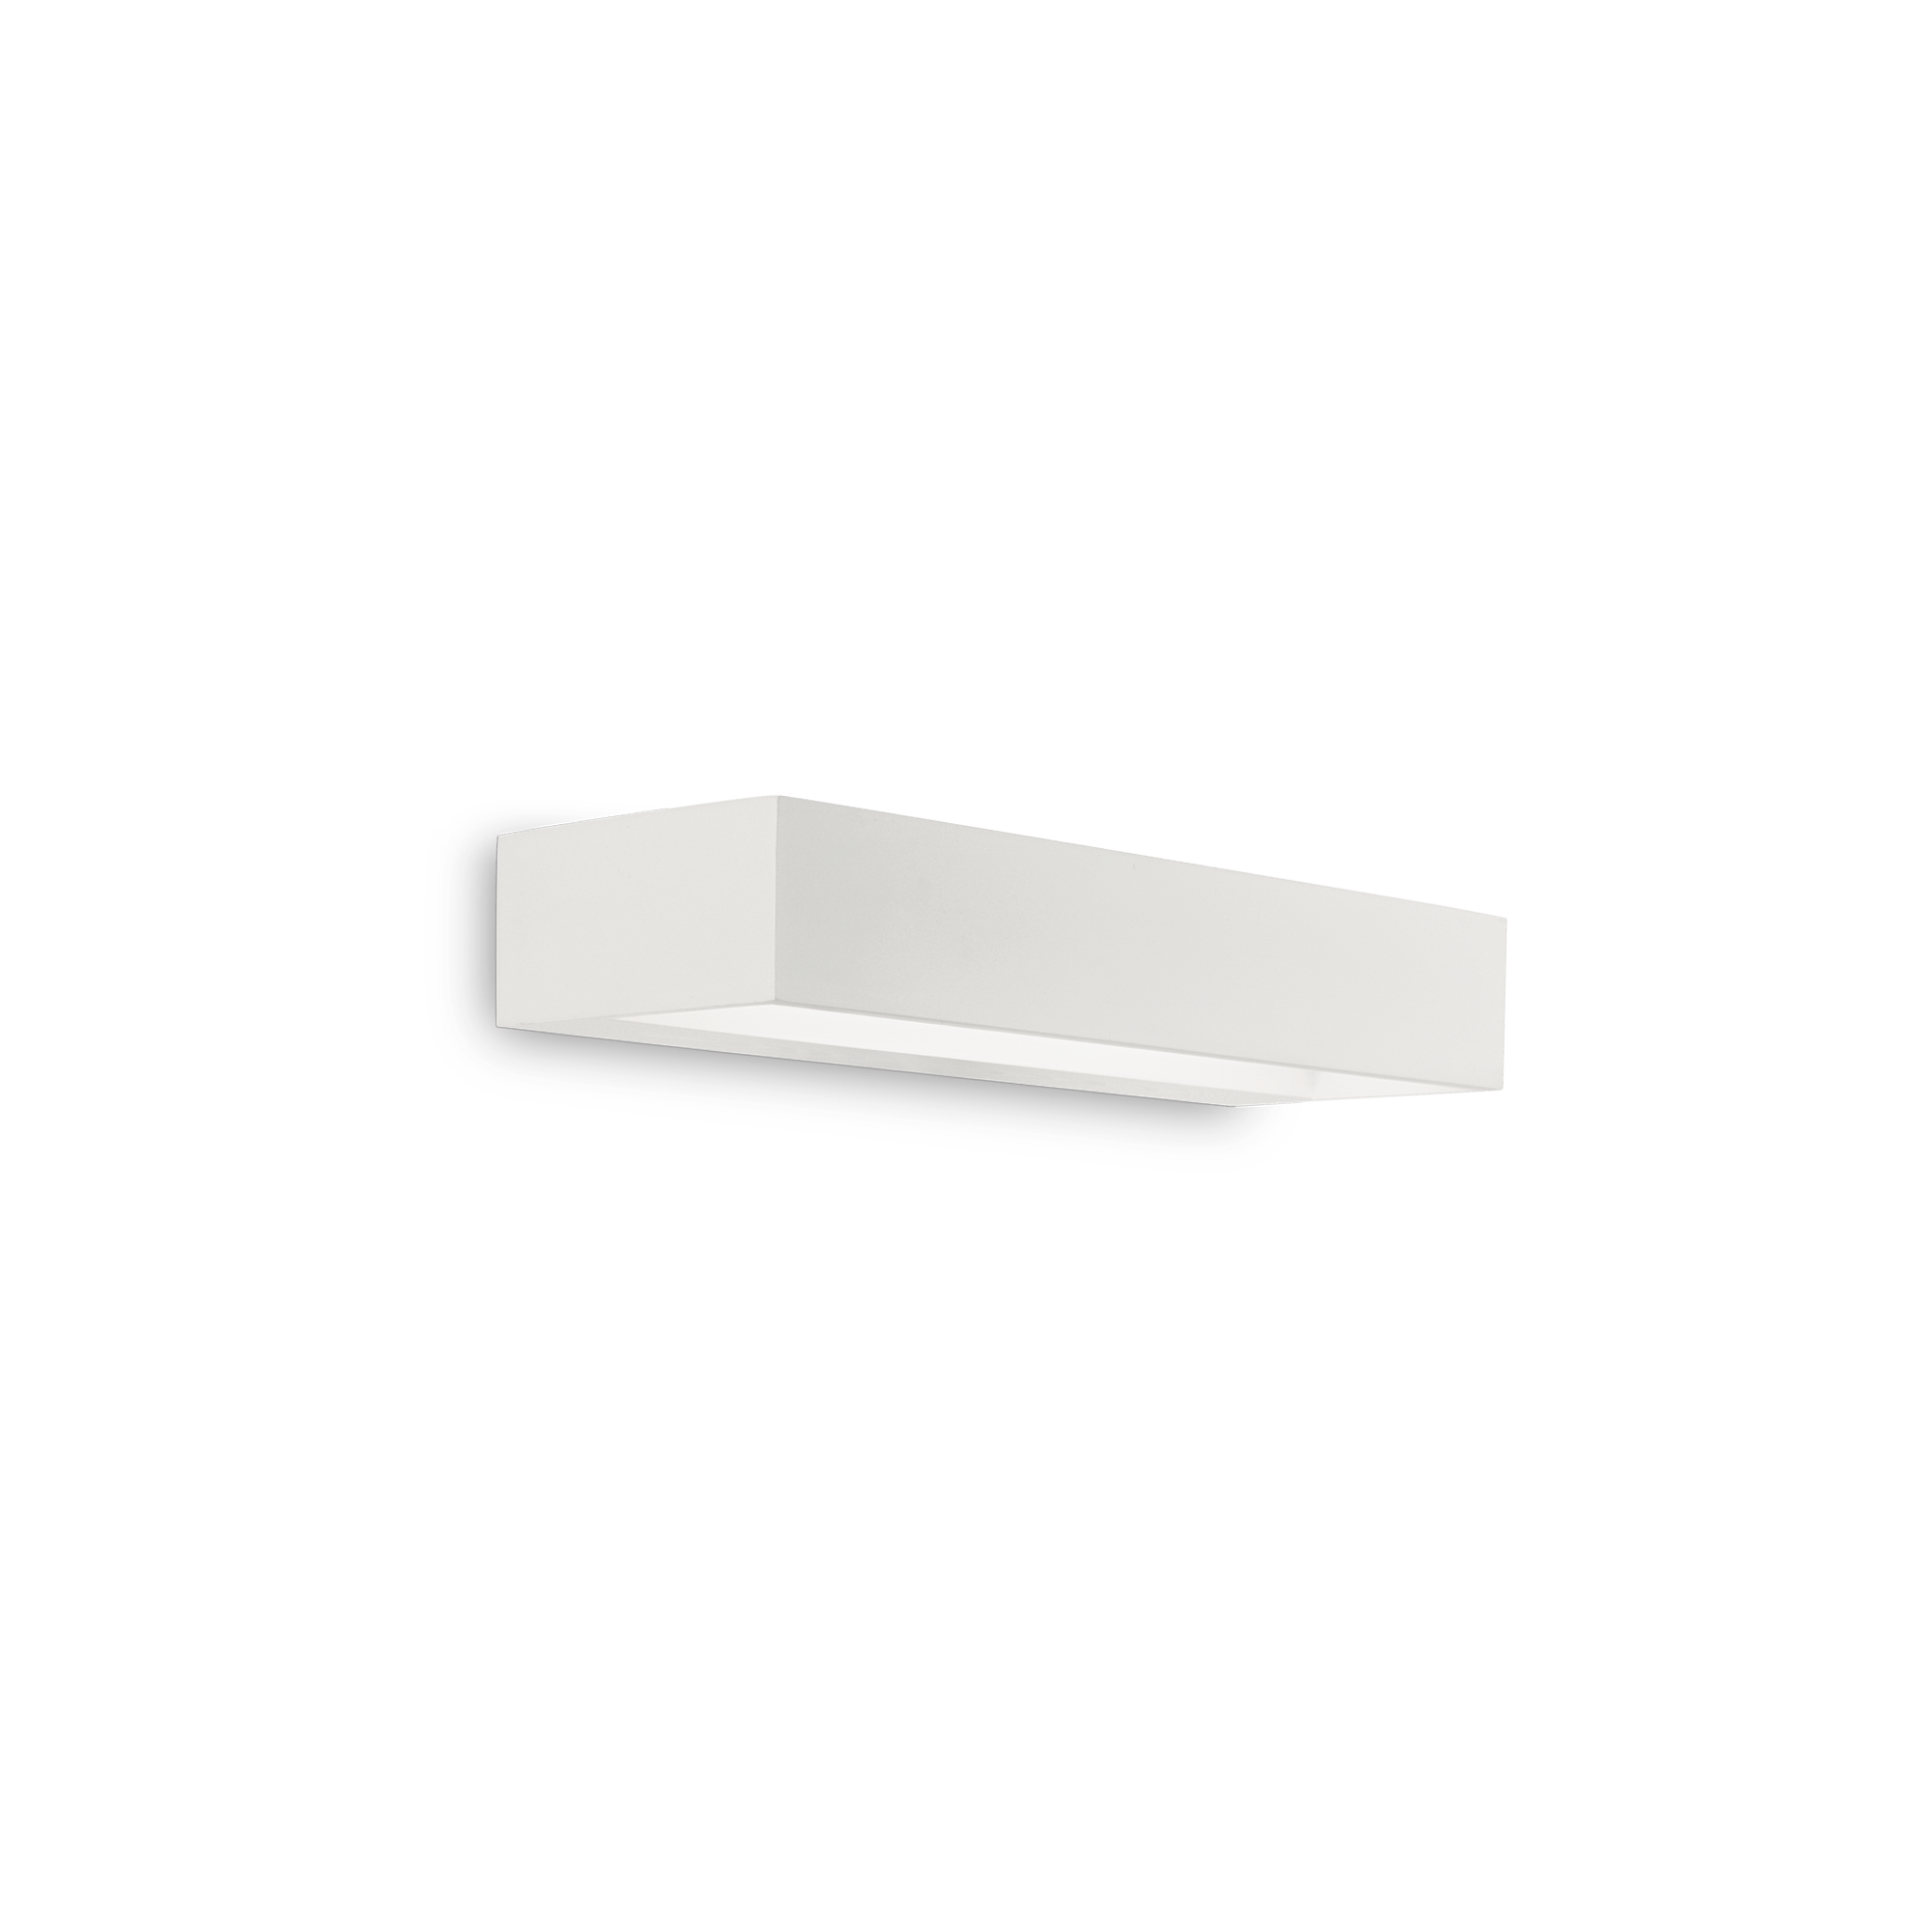 Ideal Lux 161785 CUBE AP1 SMALL falilámpa